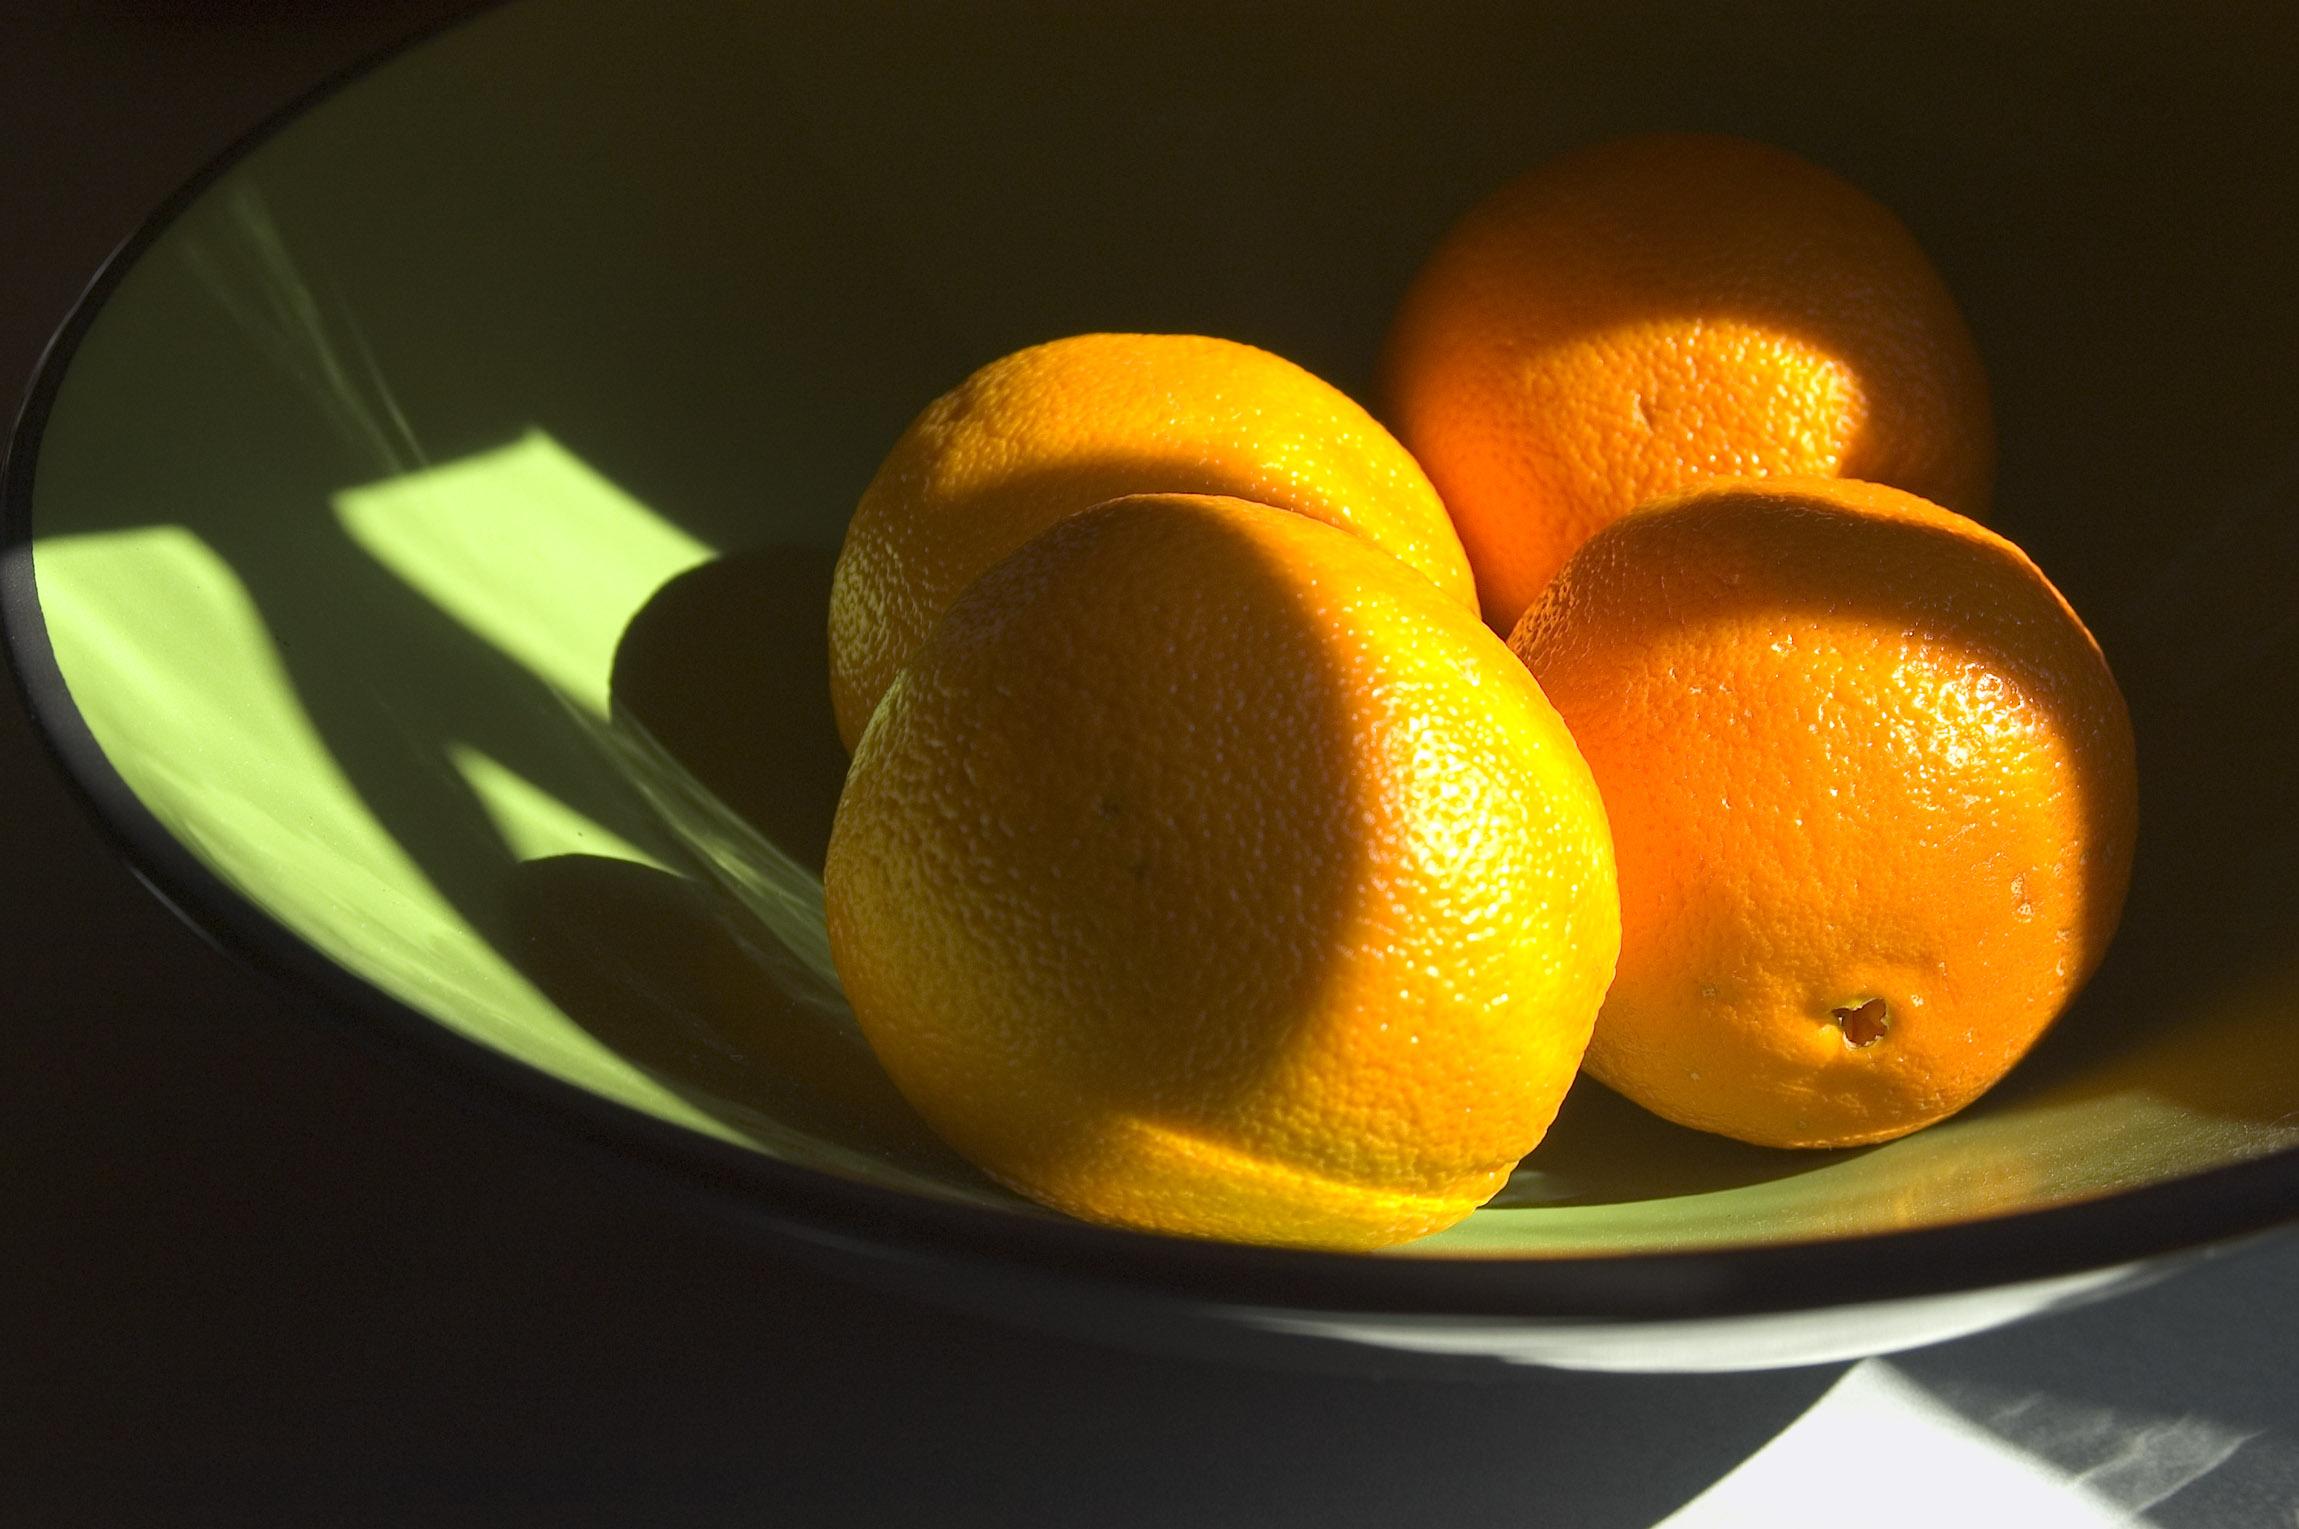 Oranges In a Bowl